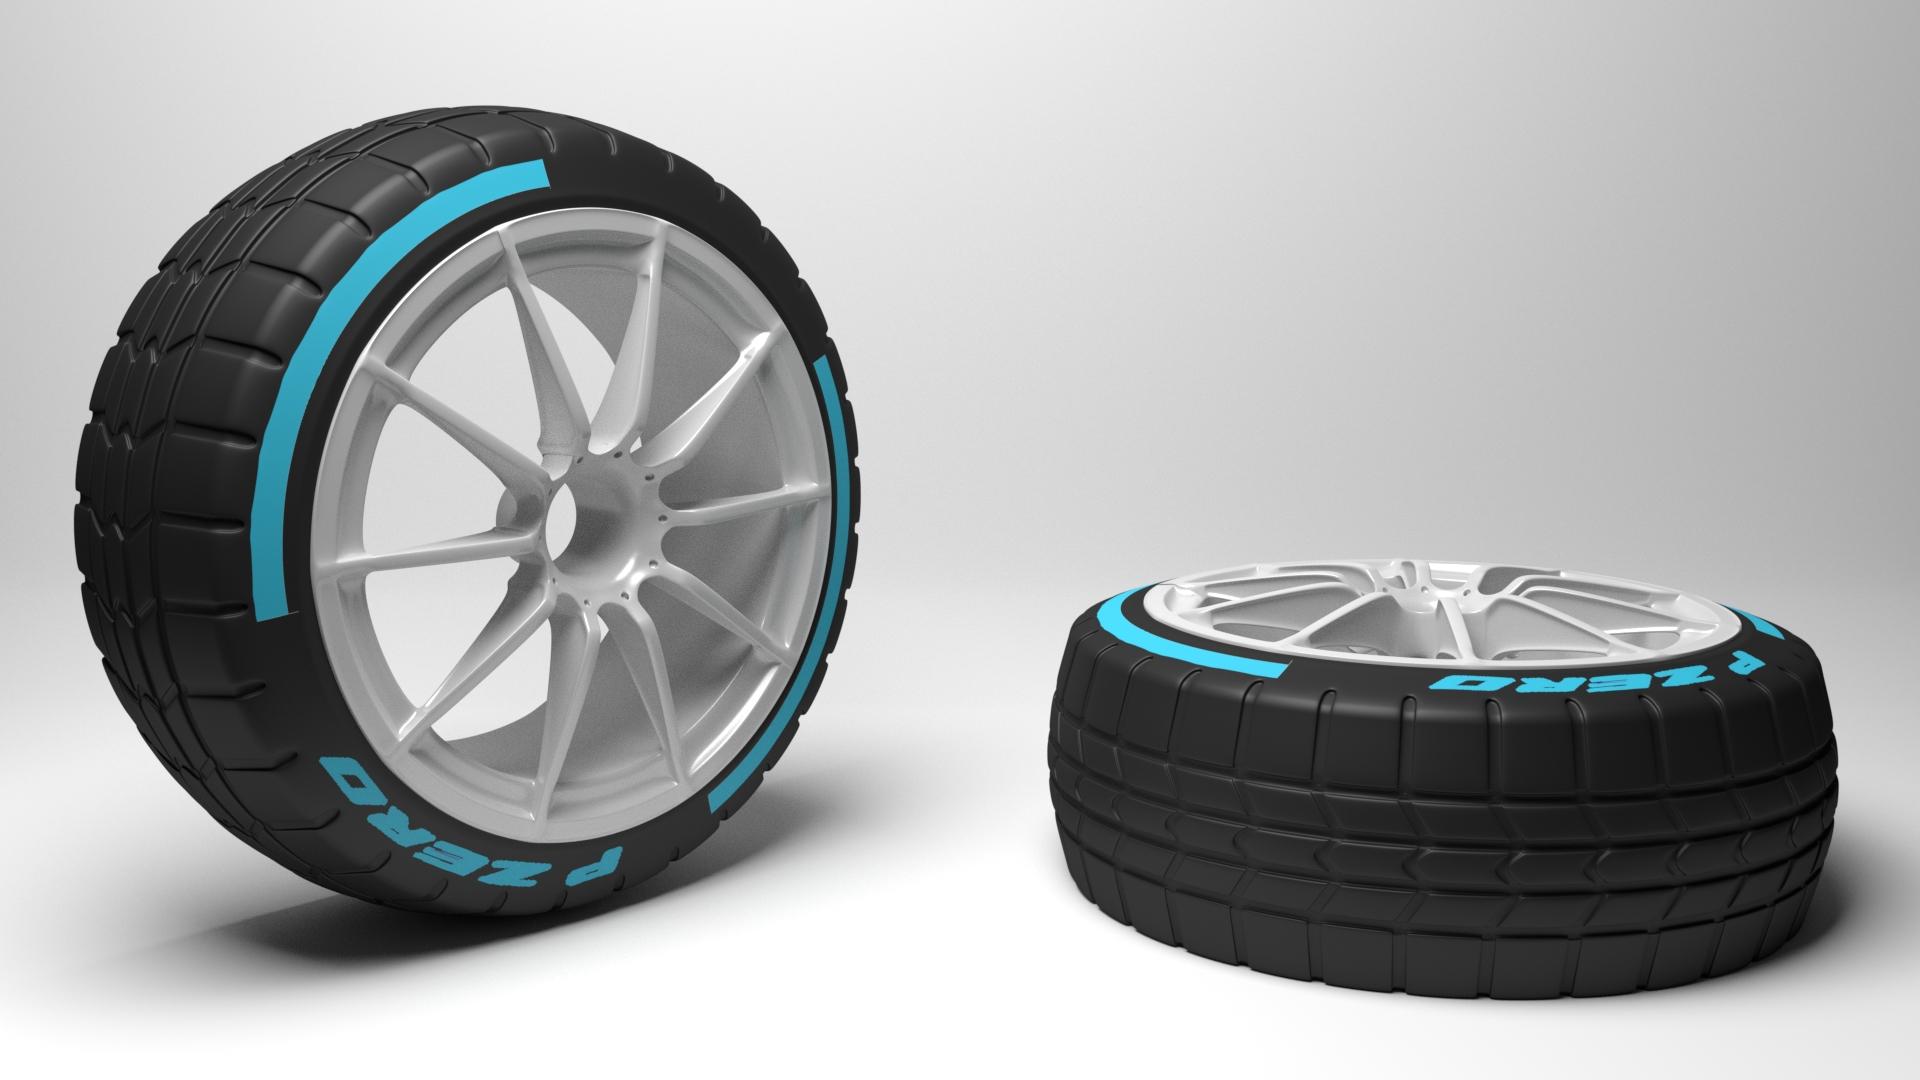 f_tires_04.jpg.07030753f89daf117570d1d97b2ac2f2.jpg